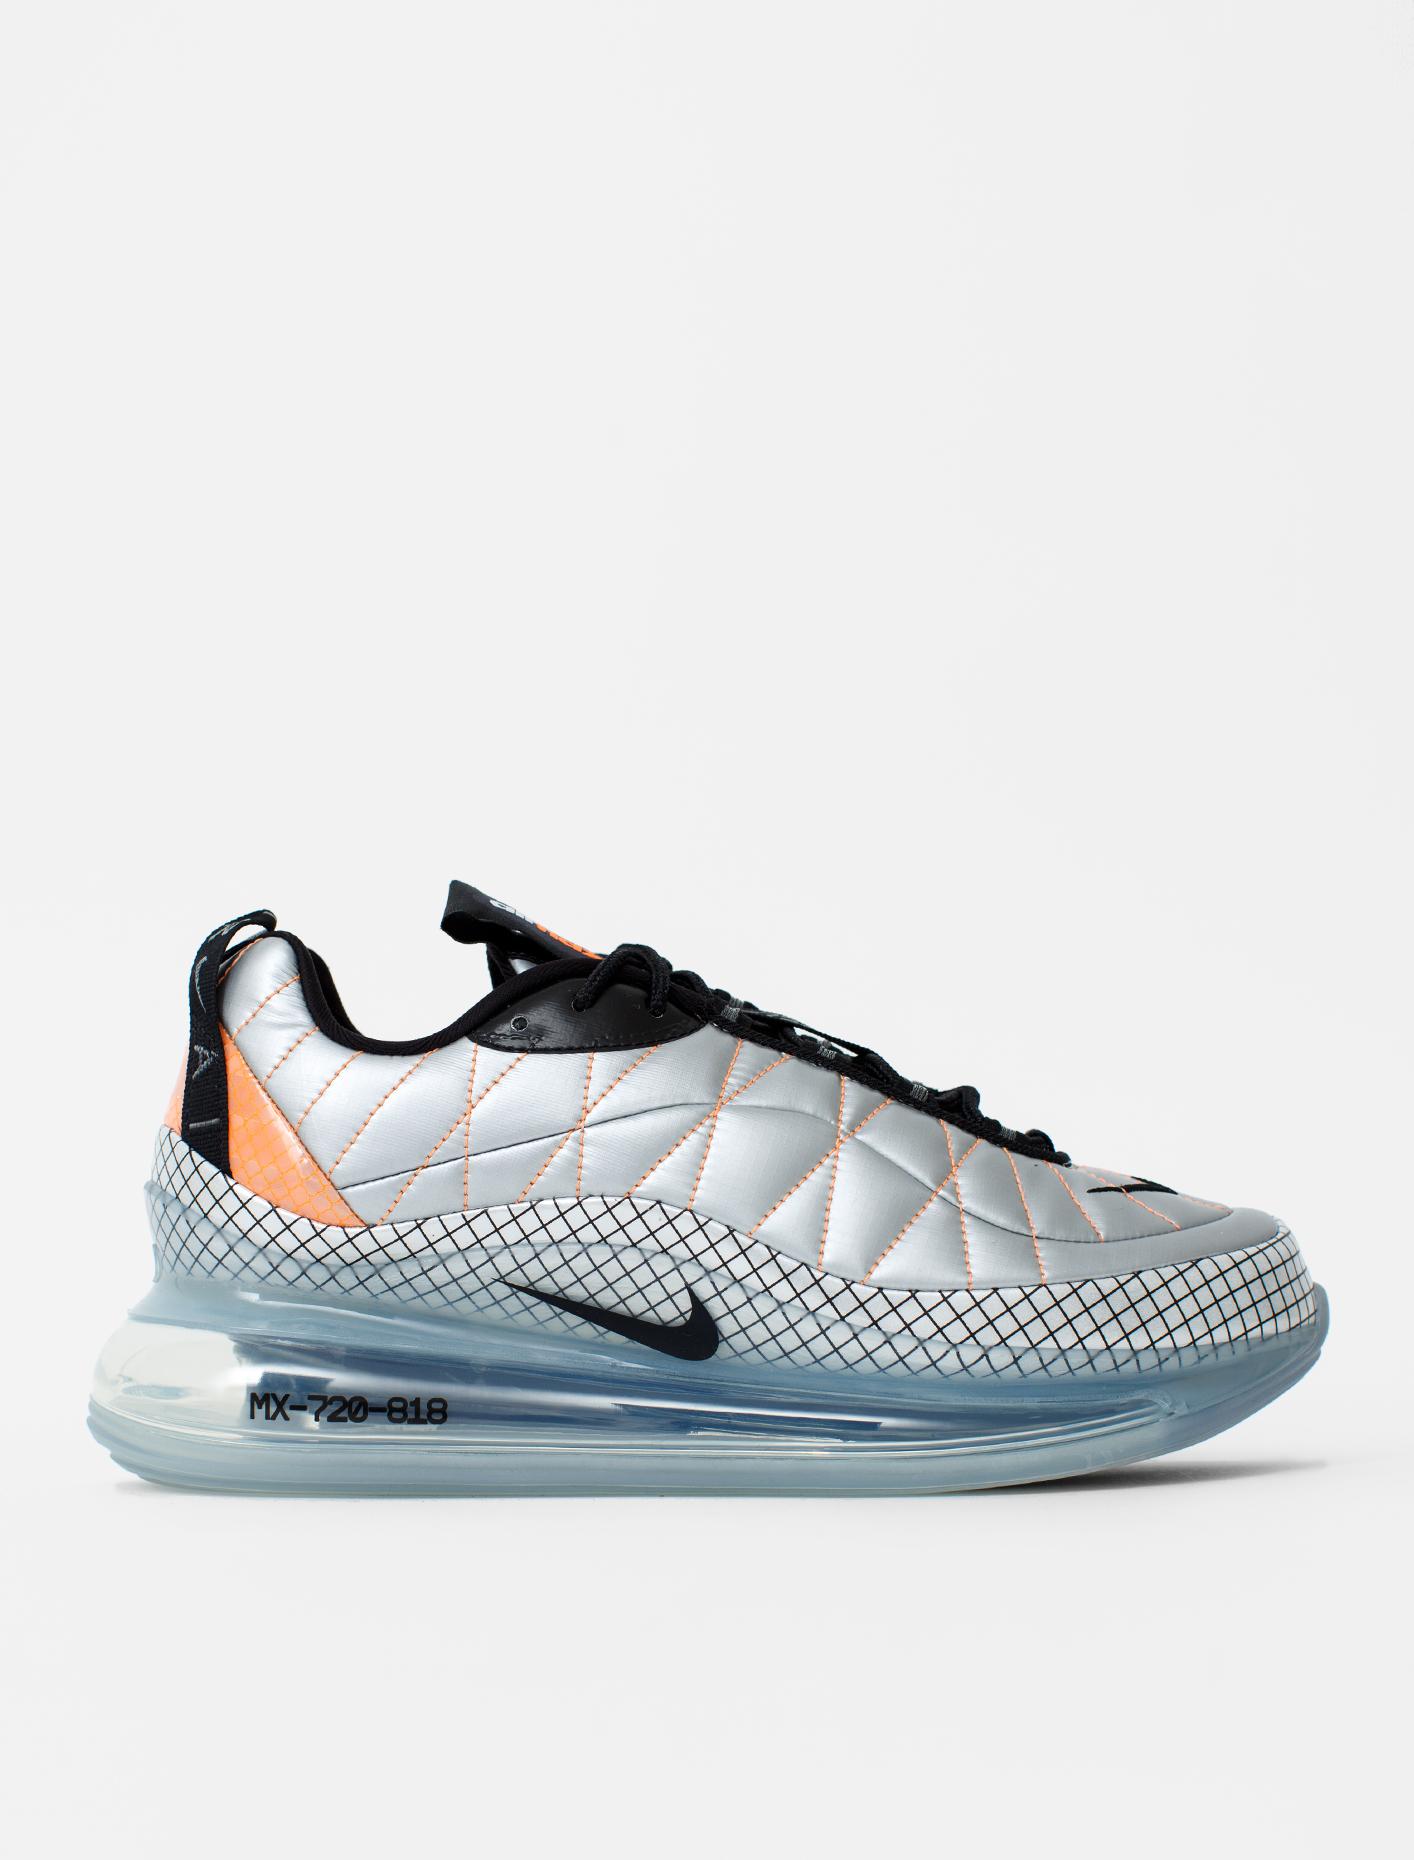 atractivo telegrama paciente  Nike WMNS MX-720-818 Sneaker | Voo Store Berlin | Worldwide Shipping